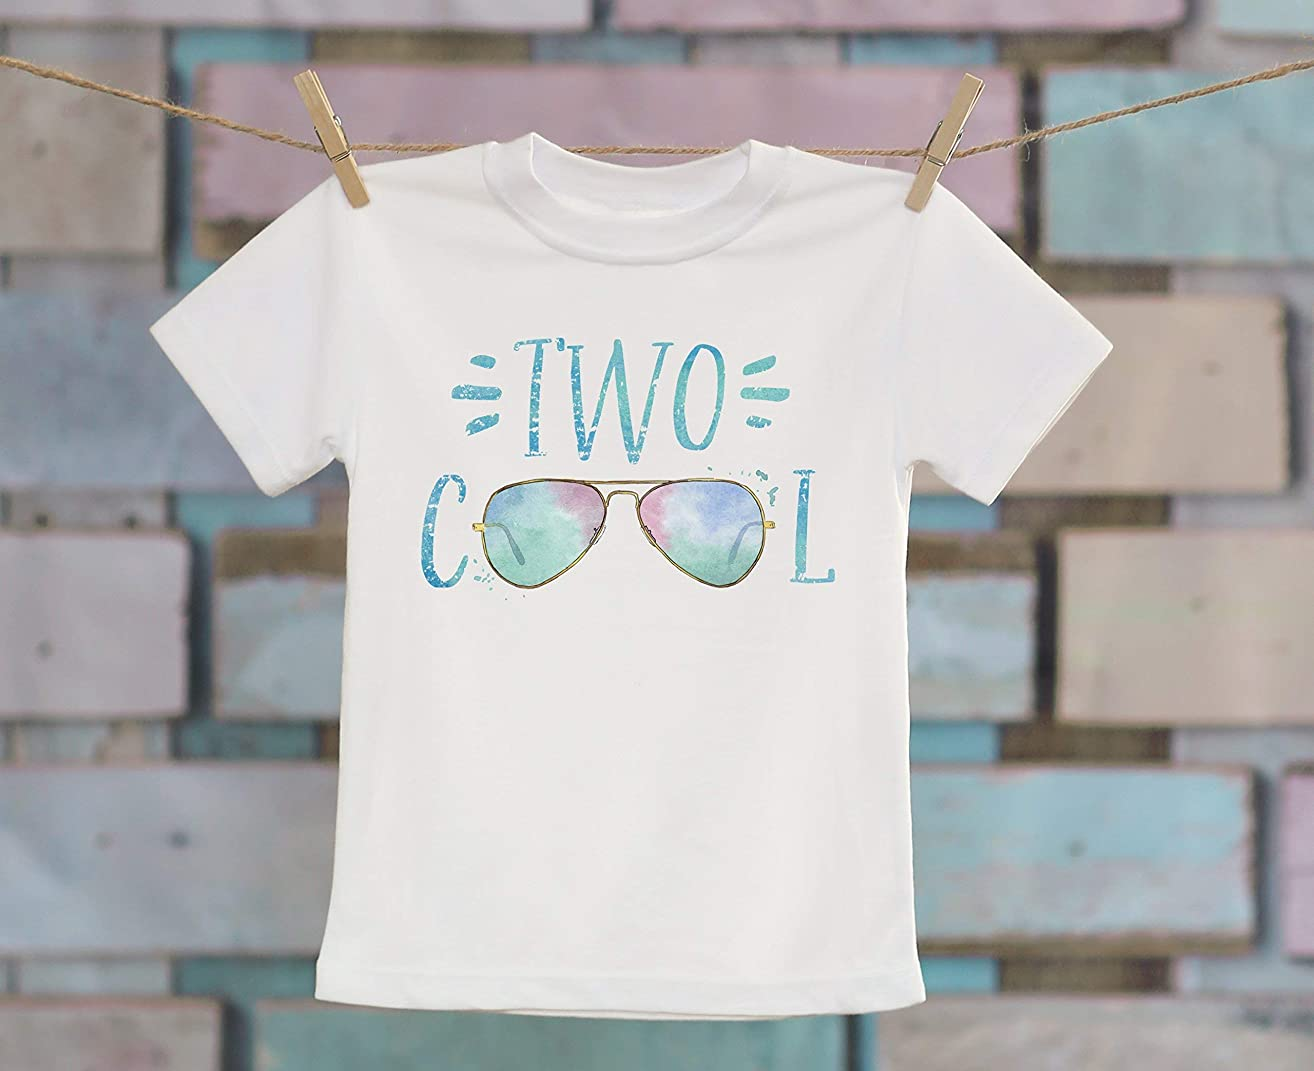 Two Cool Sunglasses in Aqua T-Shirt, Birthday Shirt, Customized Shirt, Retro Style T-Shirt, Cute T-Shirt, Boho Kids